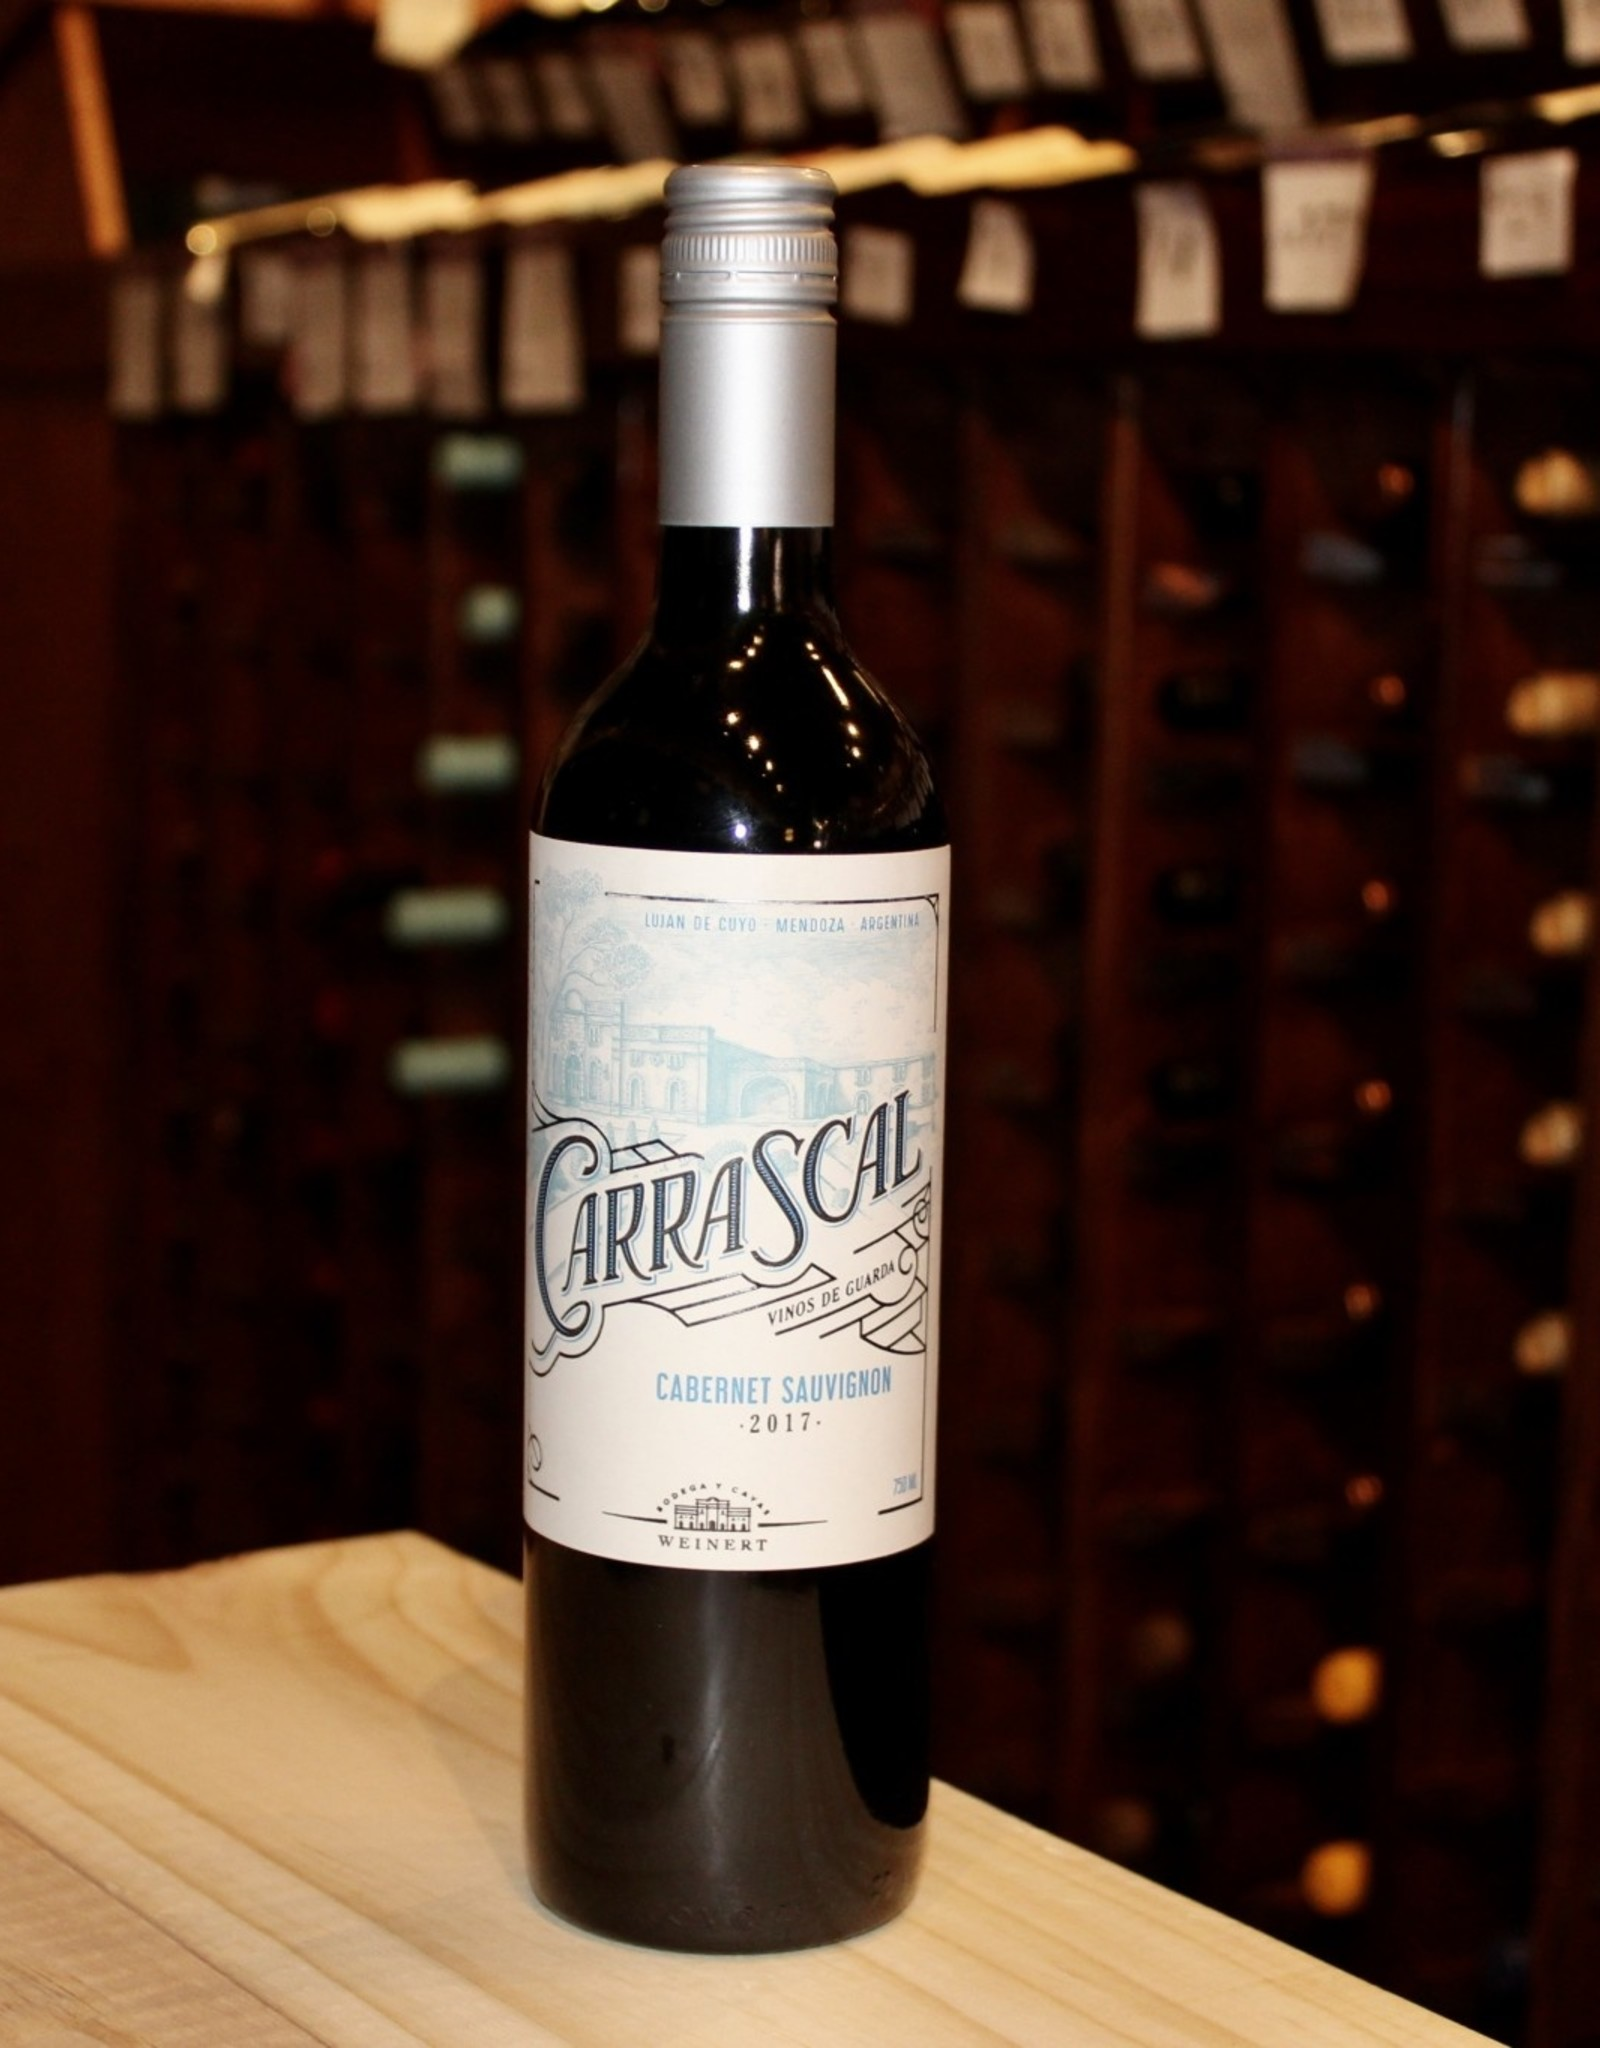 Wine 2017 Bodega Weinert Carrascal Cabernet Sauvignon - Mendoza, Argentina (750ml)